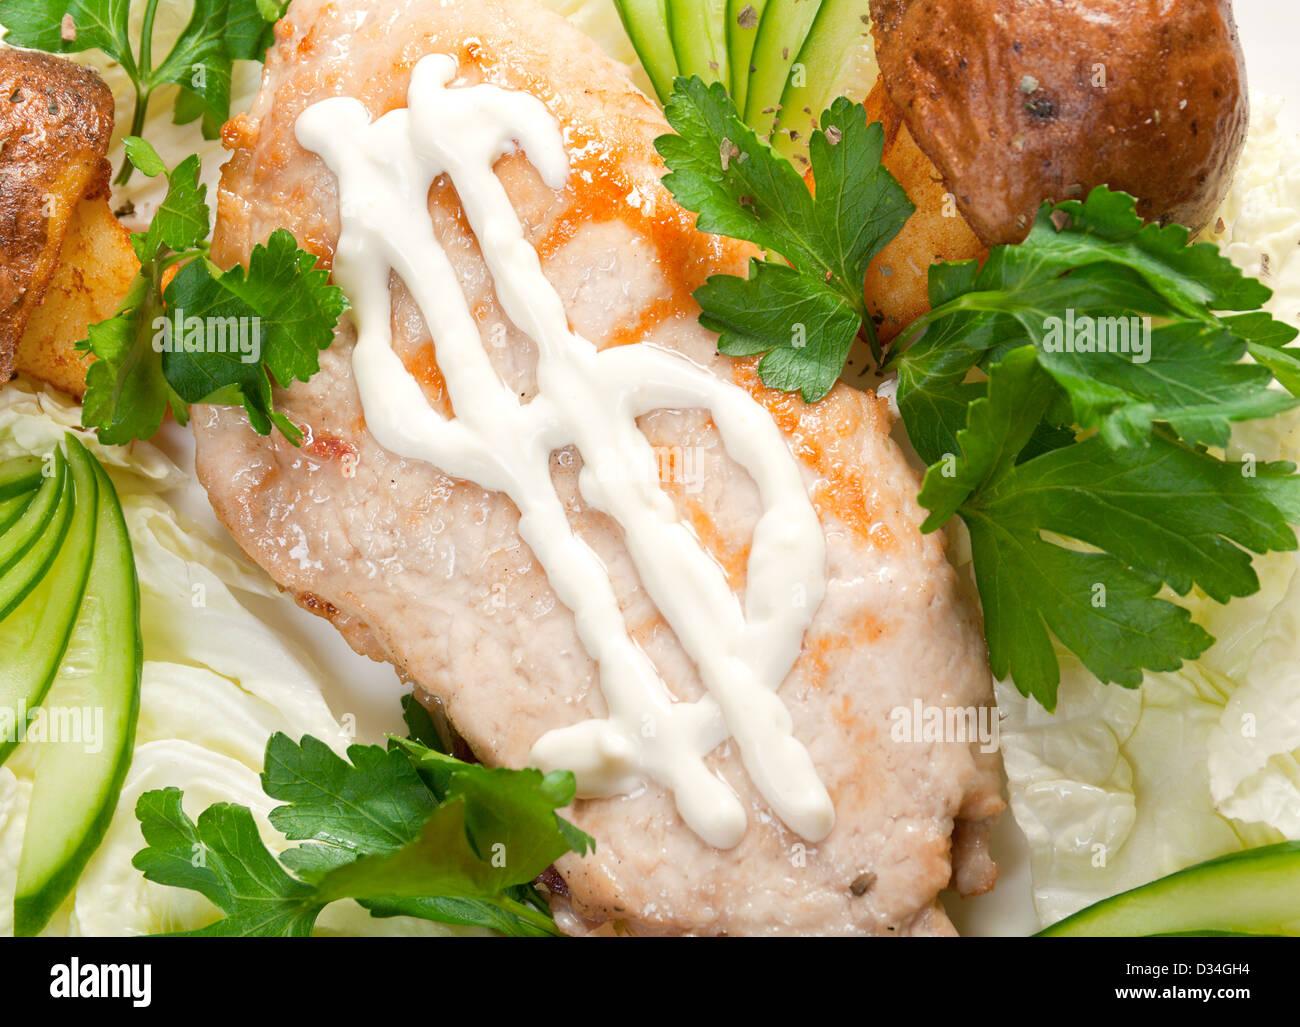 porks Roast.Italian cuisine - Stock Image